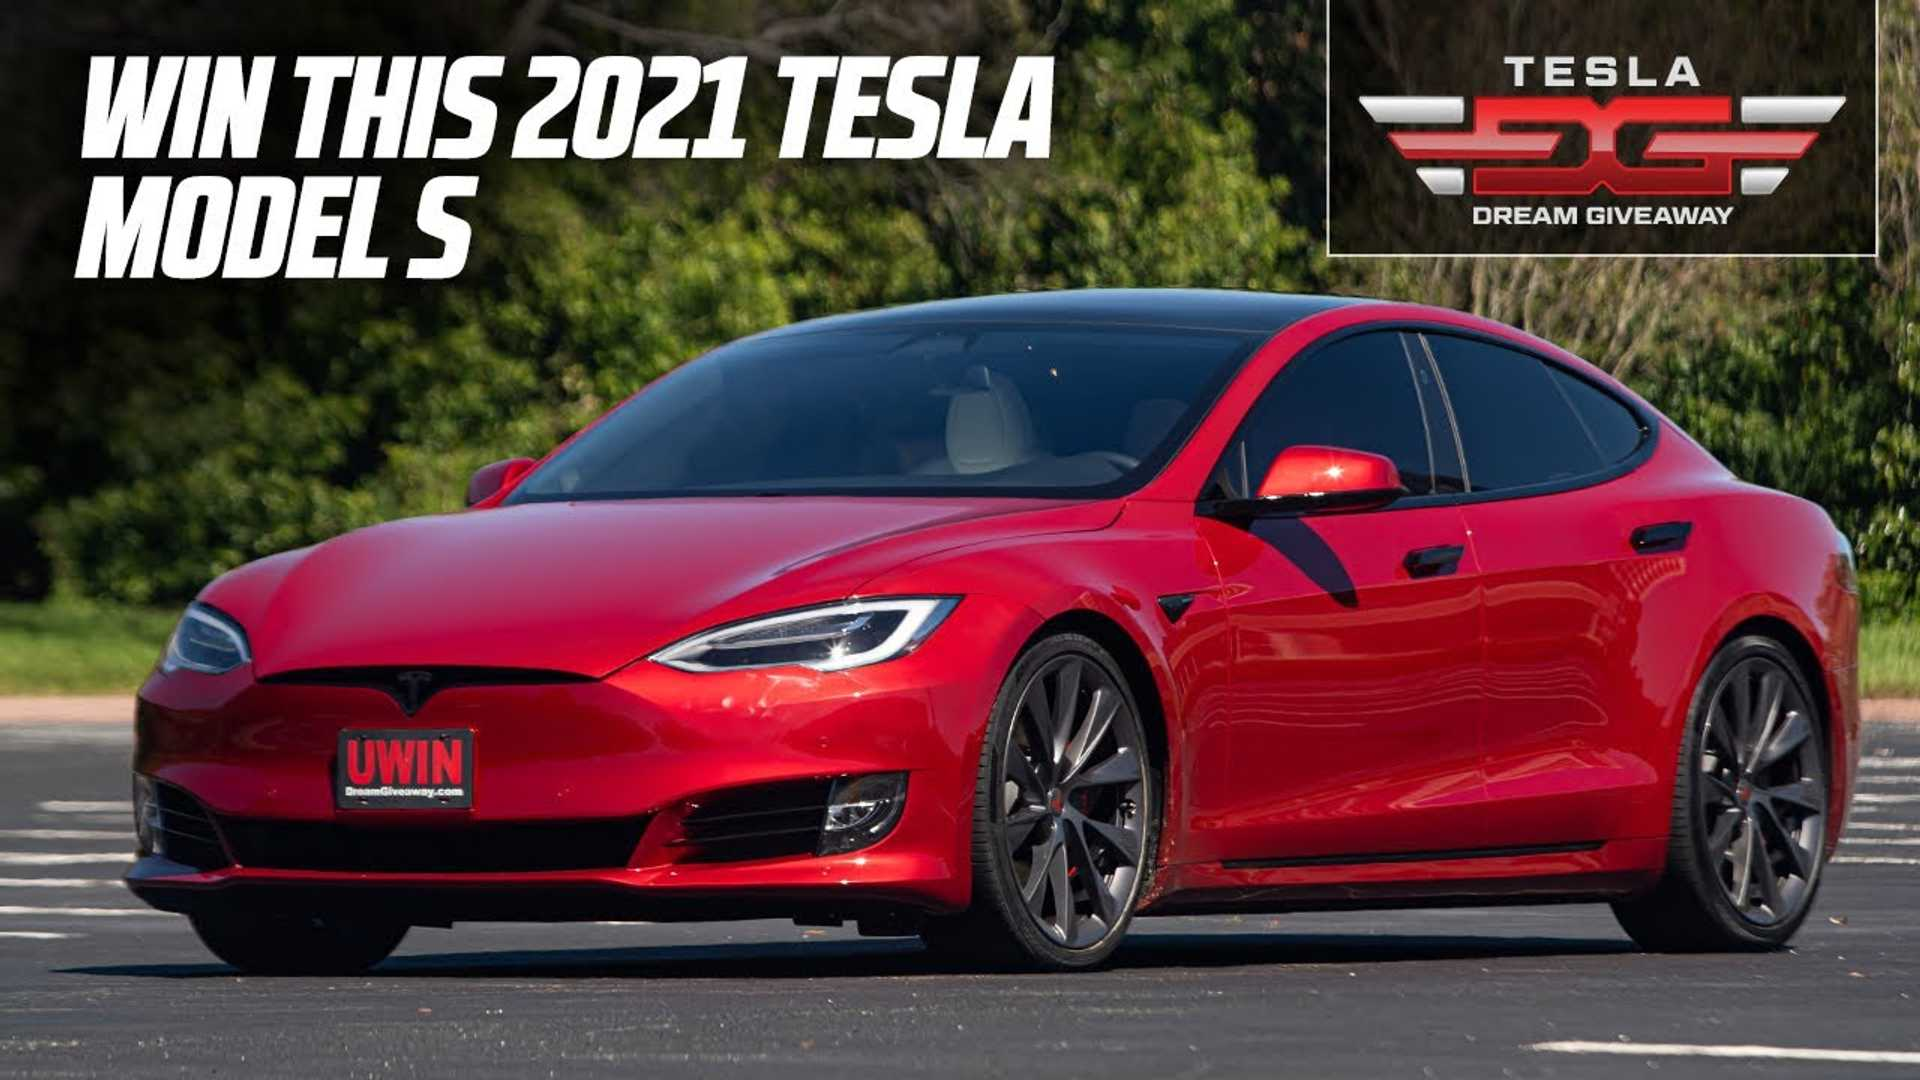 Enter Now To Win A 2021 Tesla Model S Performance Plus $27K Cash!